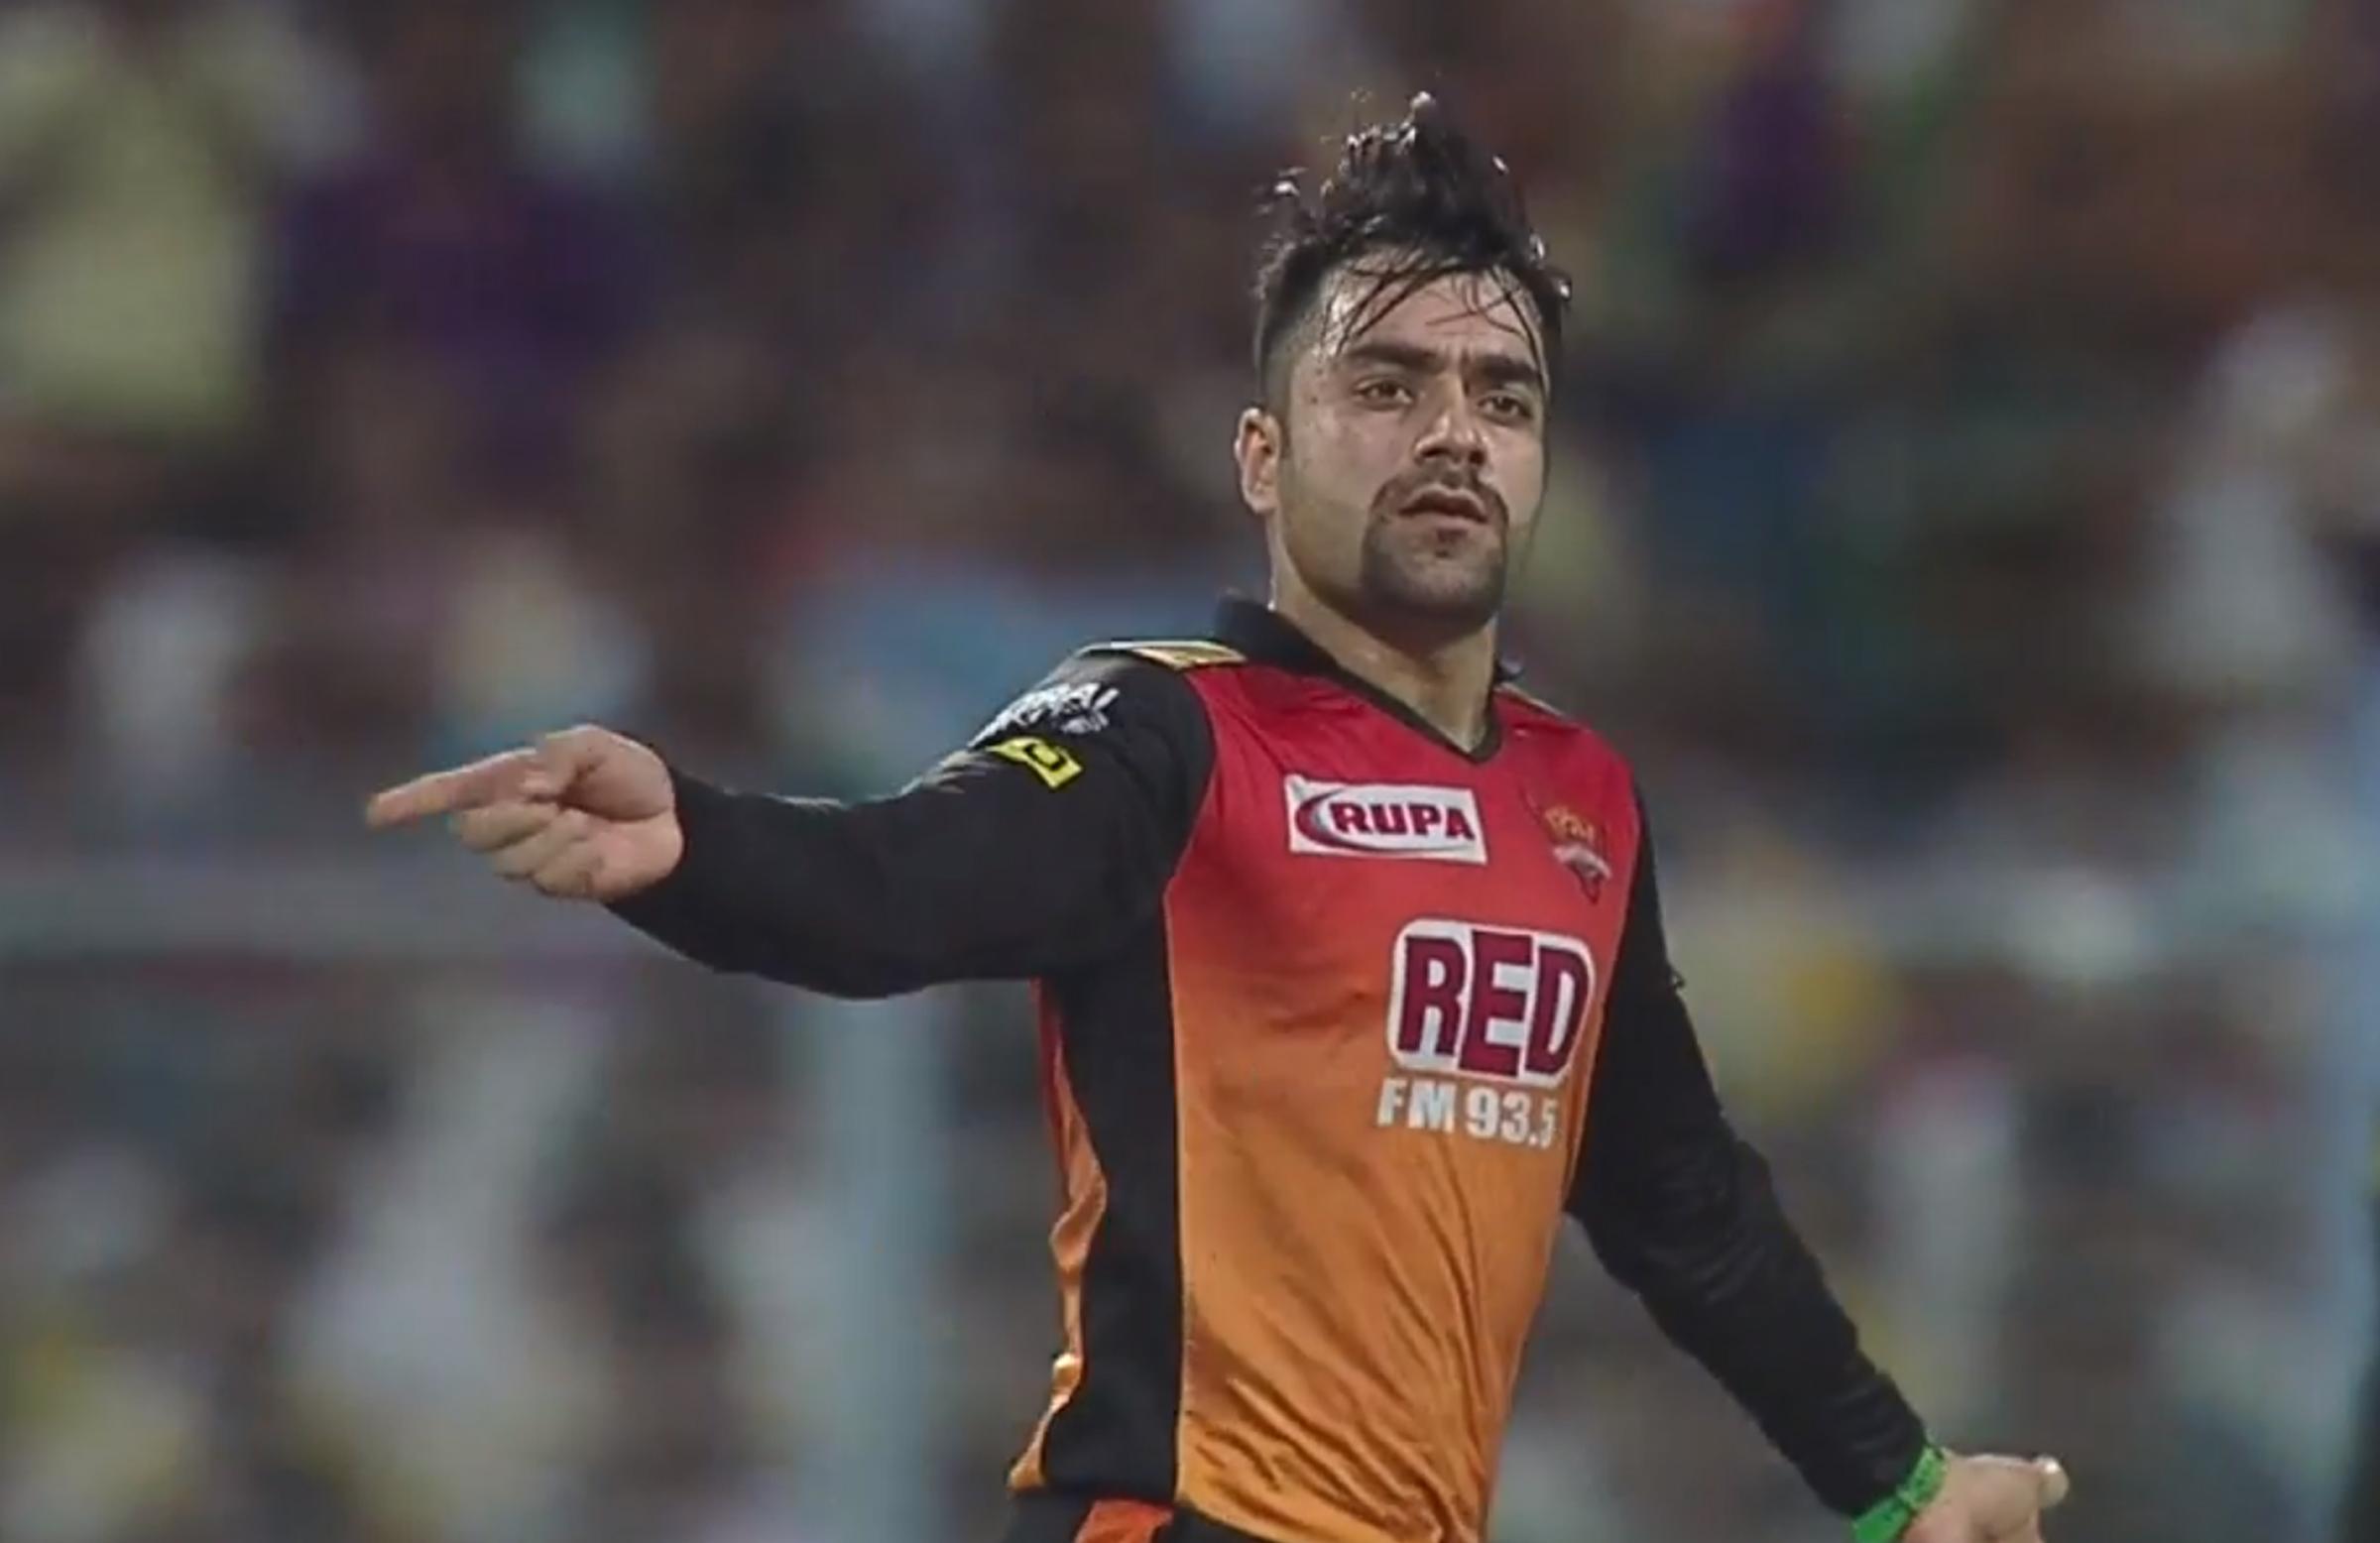 Dazzling Rashid lauded after all-round effort | cricket.com.au